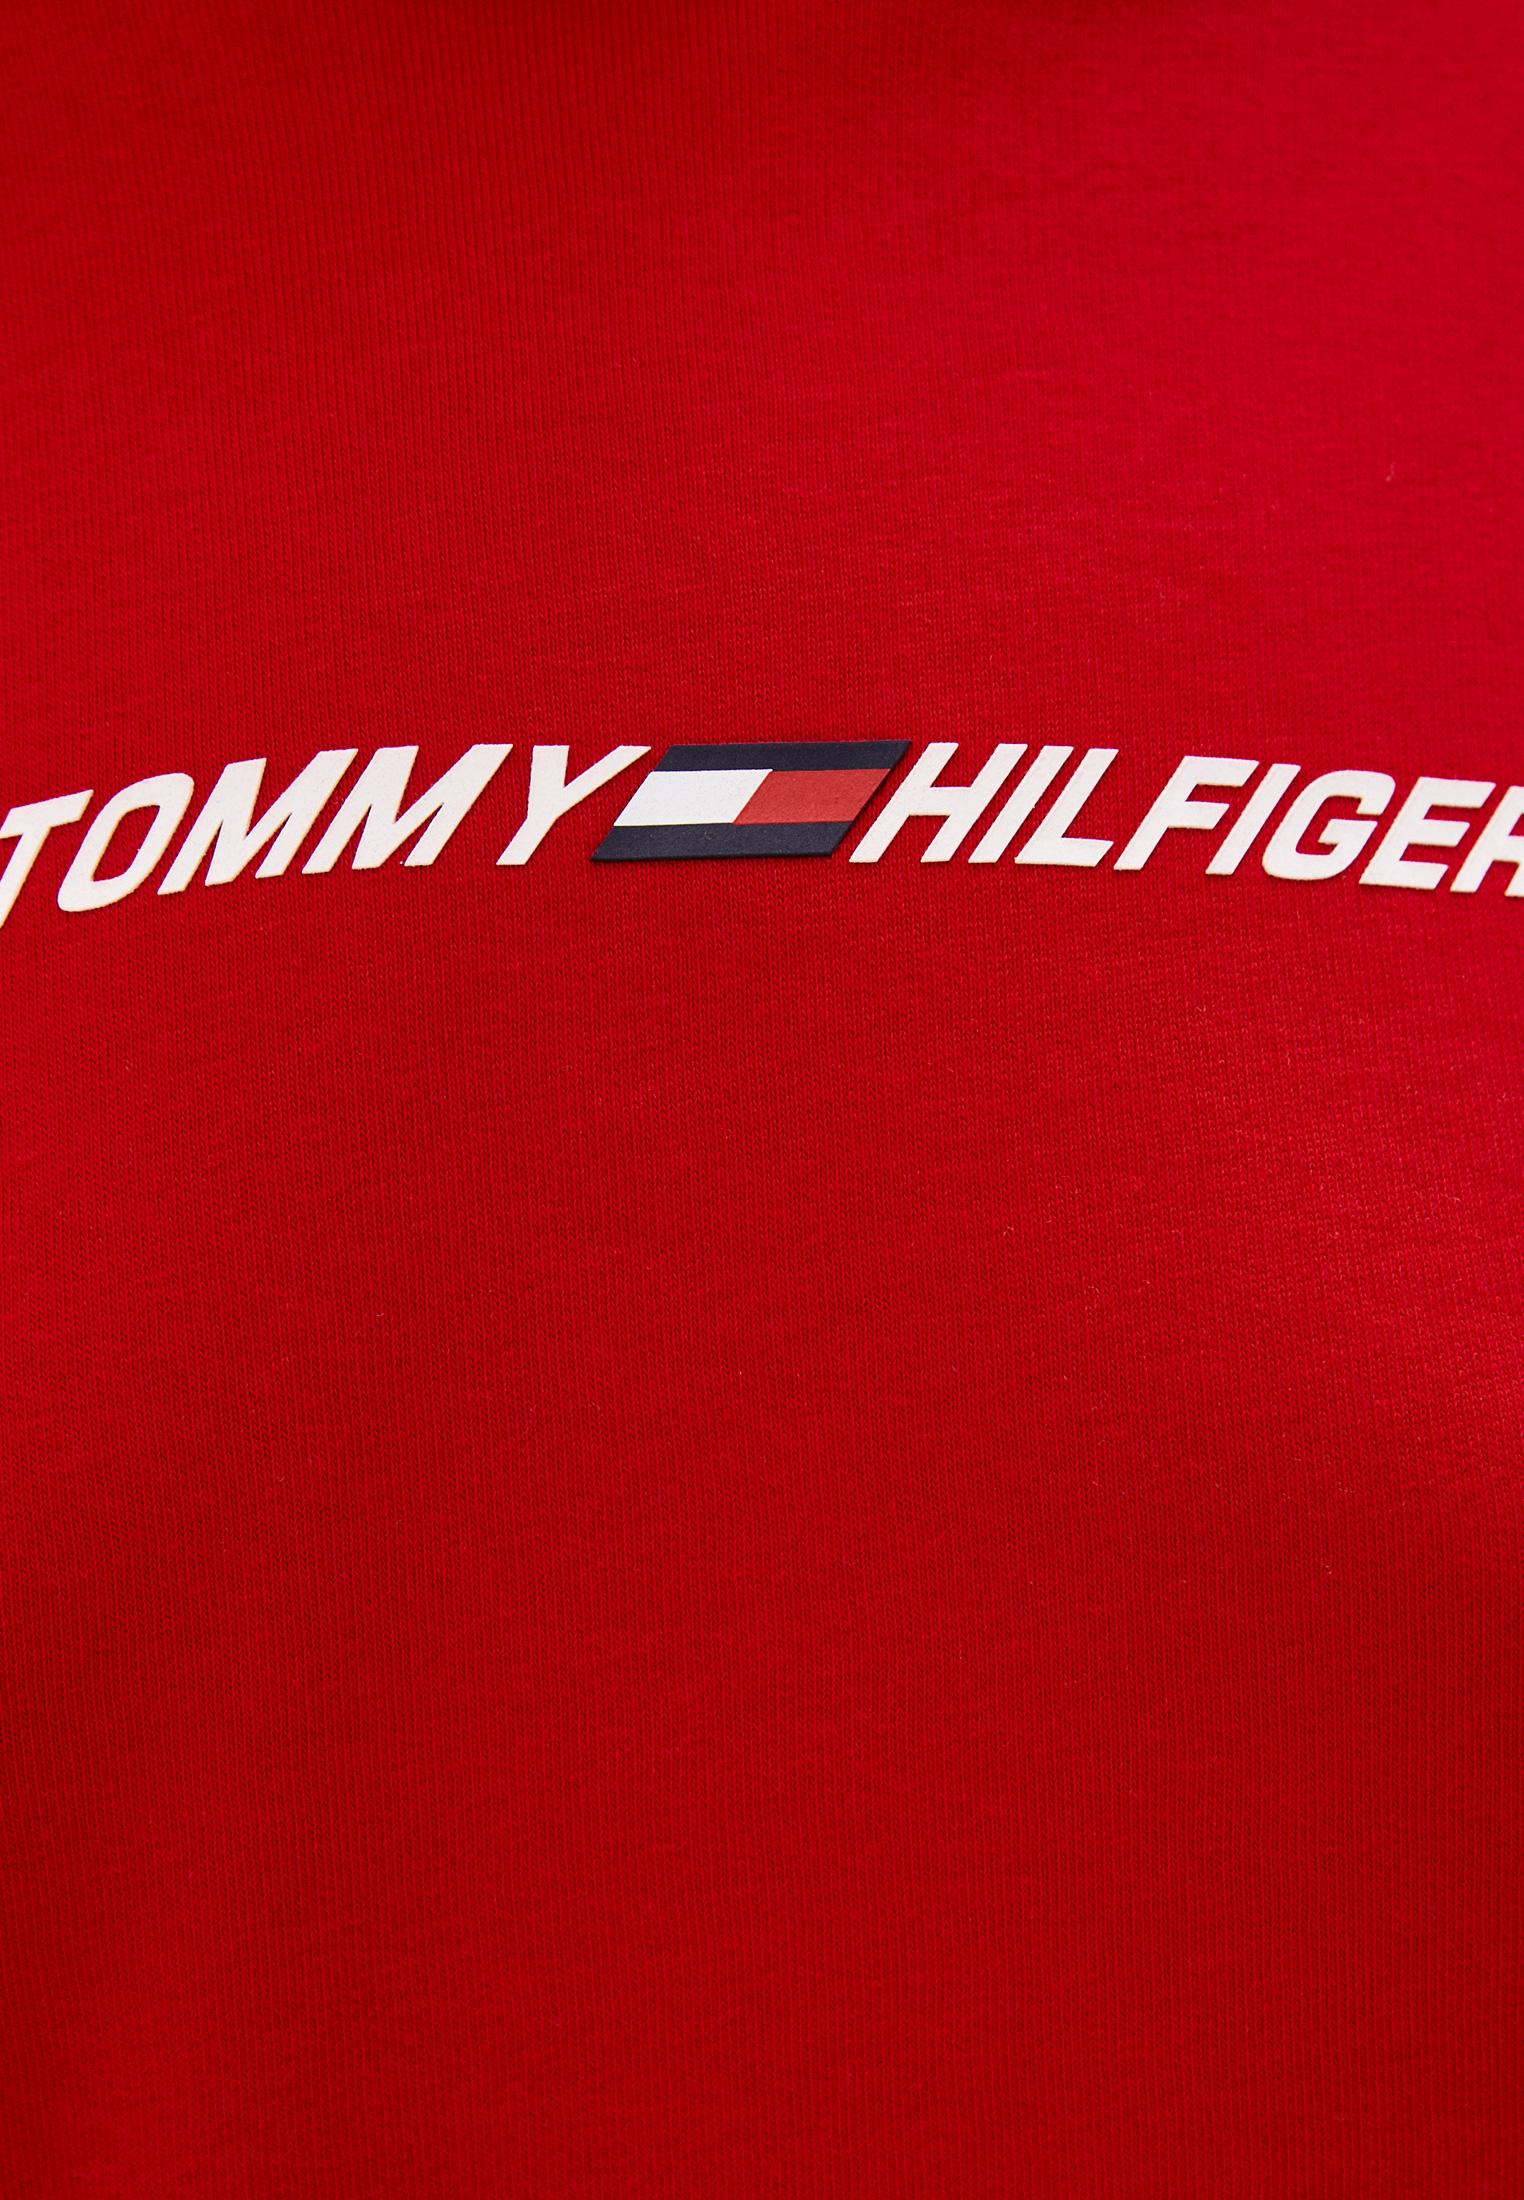 Женские худи Tommy Hilfiger (Томми Хилфигер) S10S100980: изображение 4